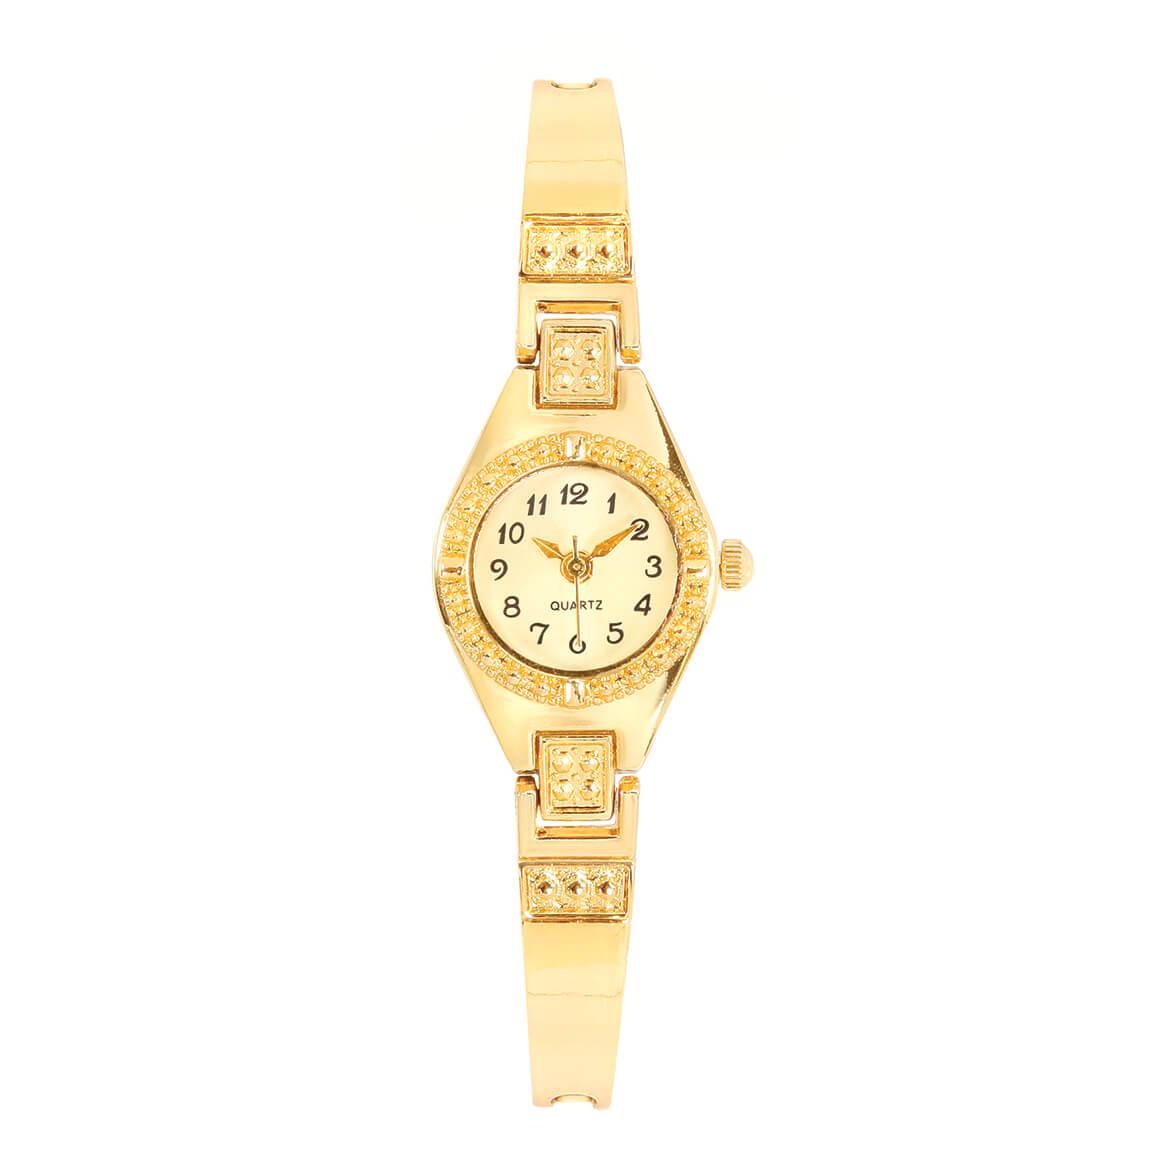 Genuine 14 Kt Gold Plated Bracelet Watch-369857